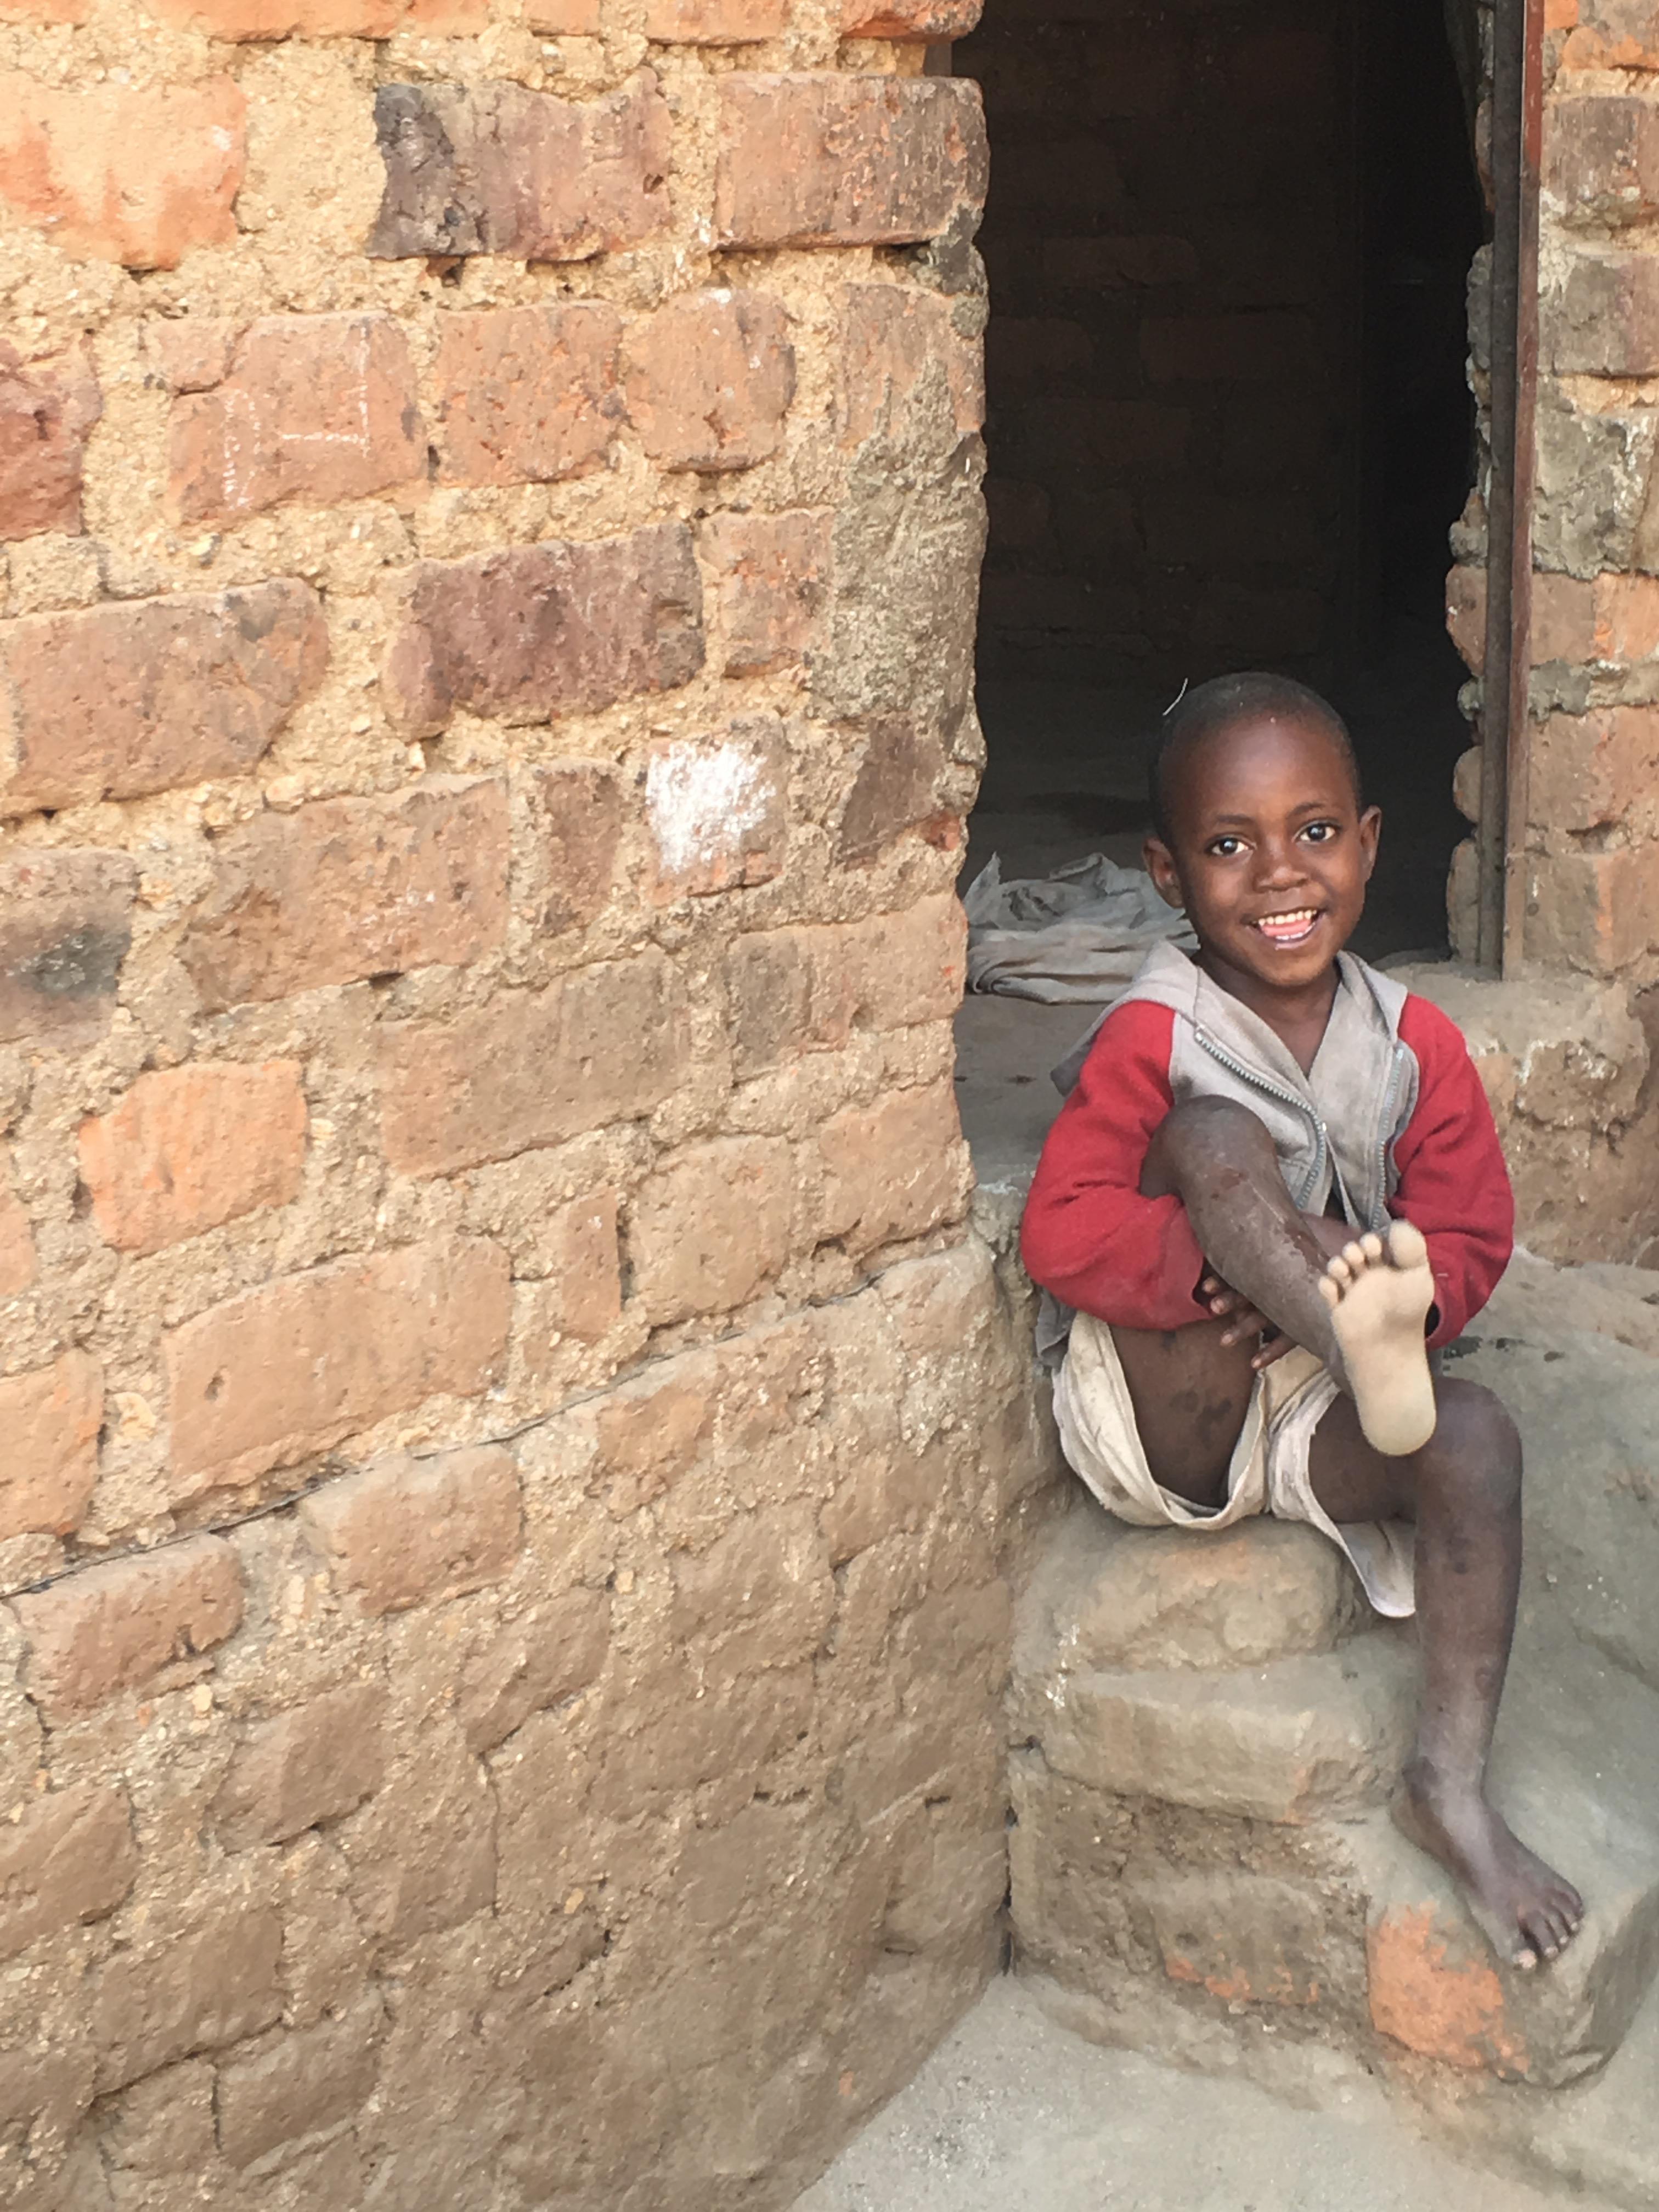 Ugandan child smiling at his home